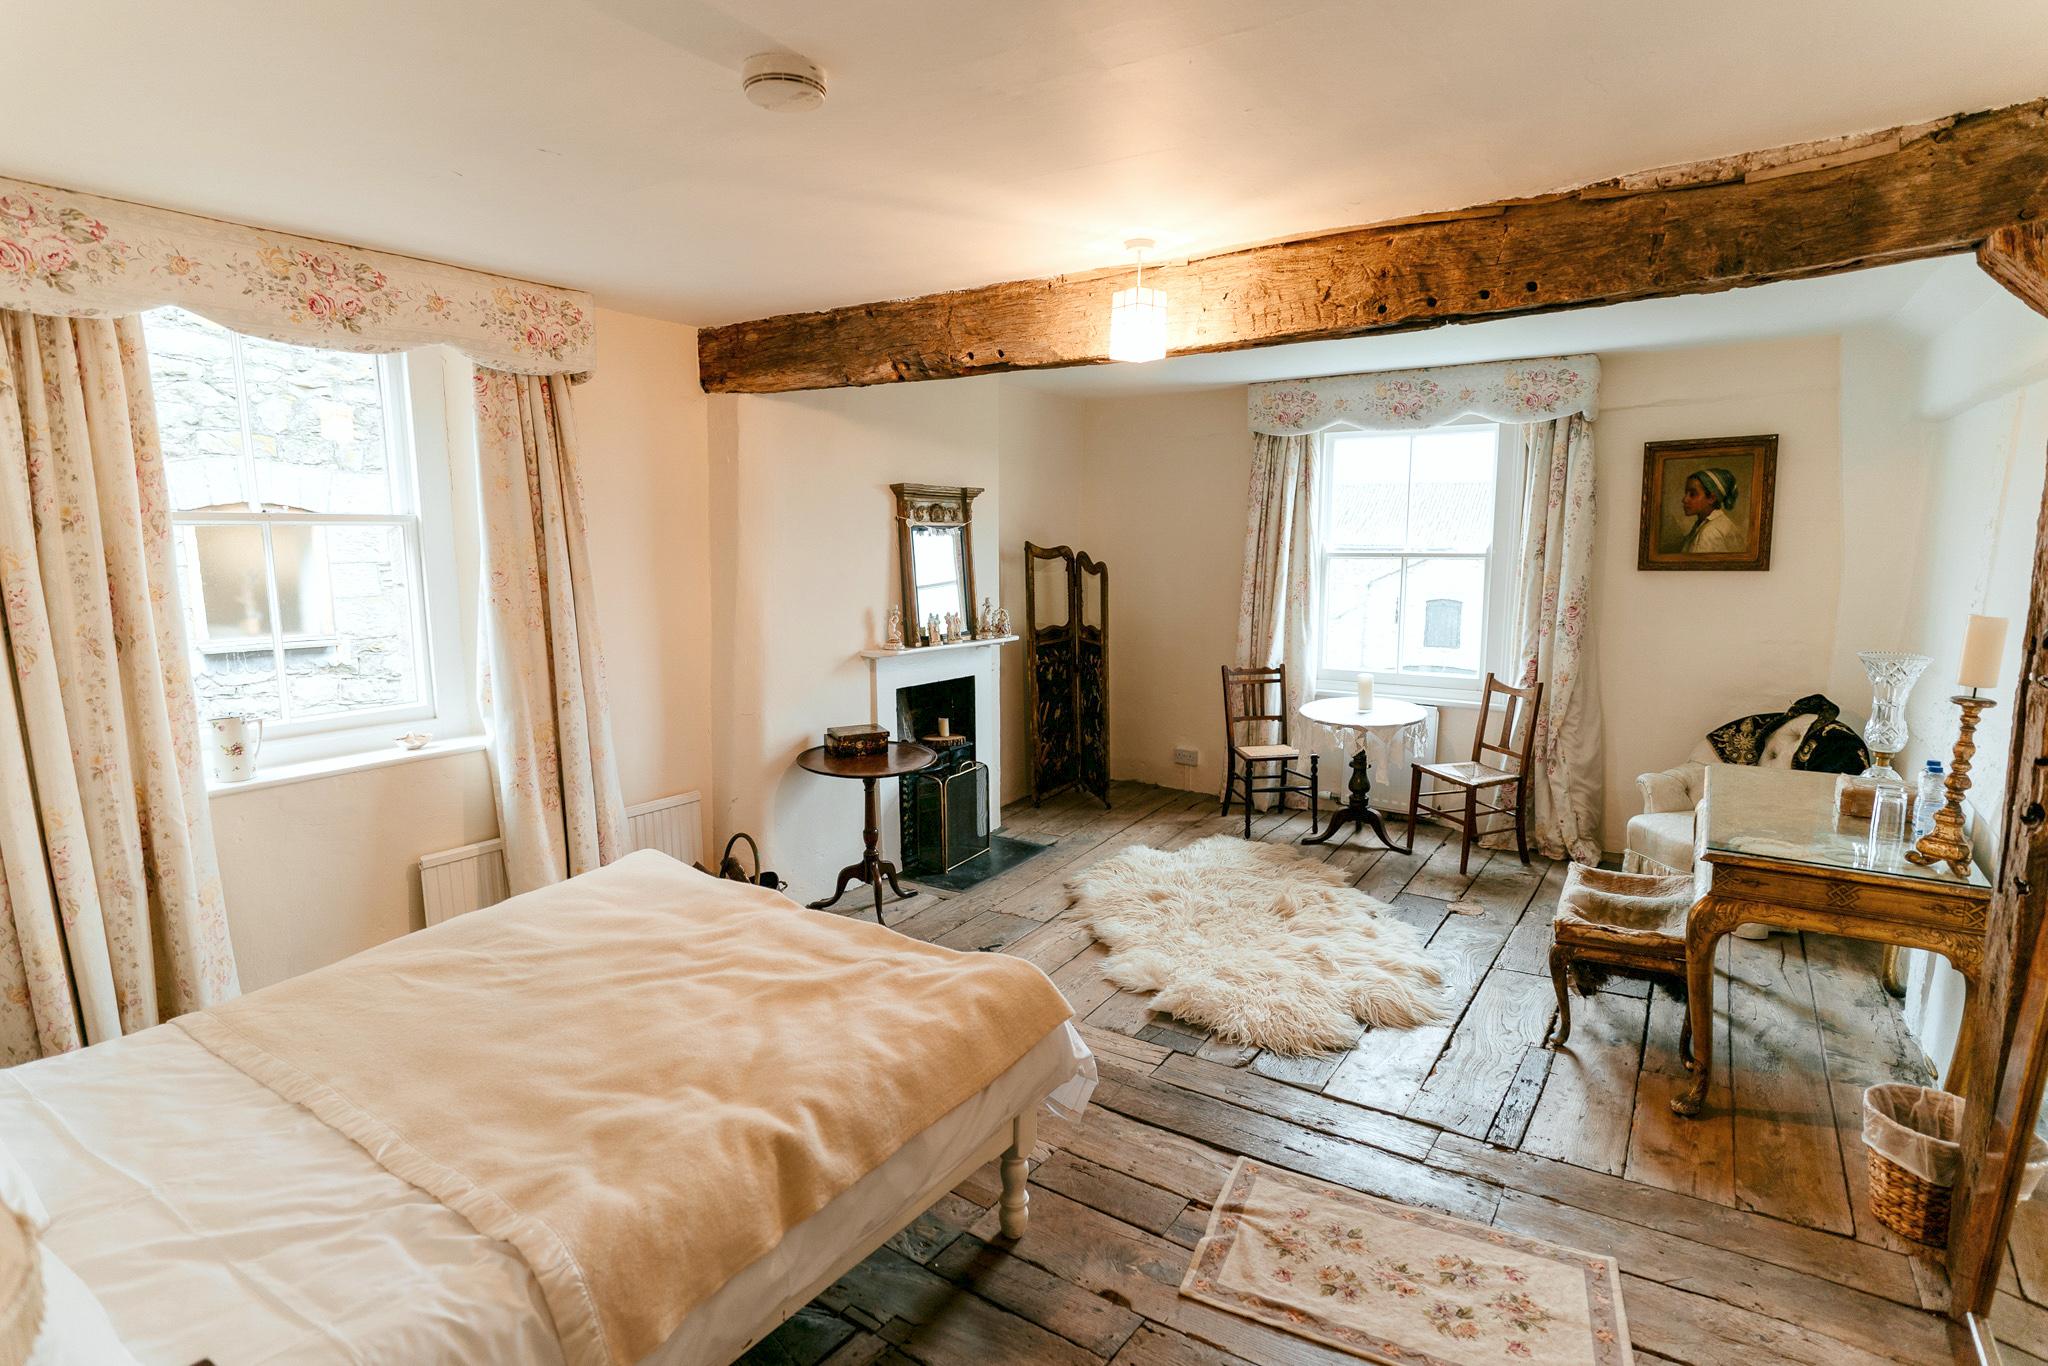 Lyde Court Wedding Venue Herefordshire - Bridal Suite Accommodation - Jarek Lepak Photographer